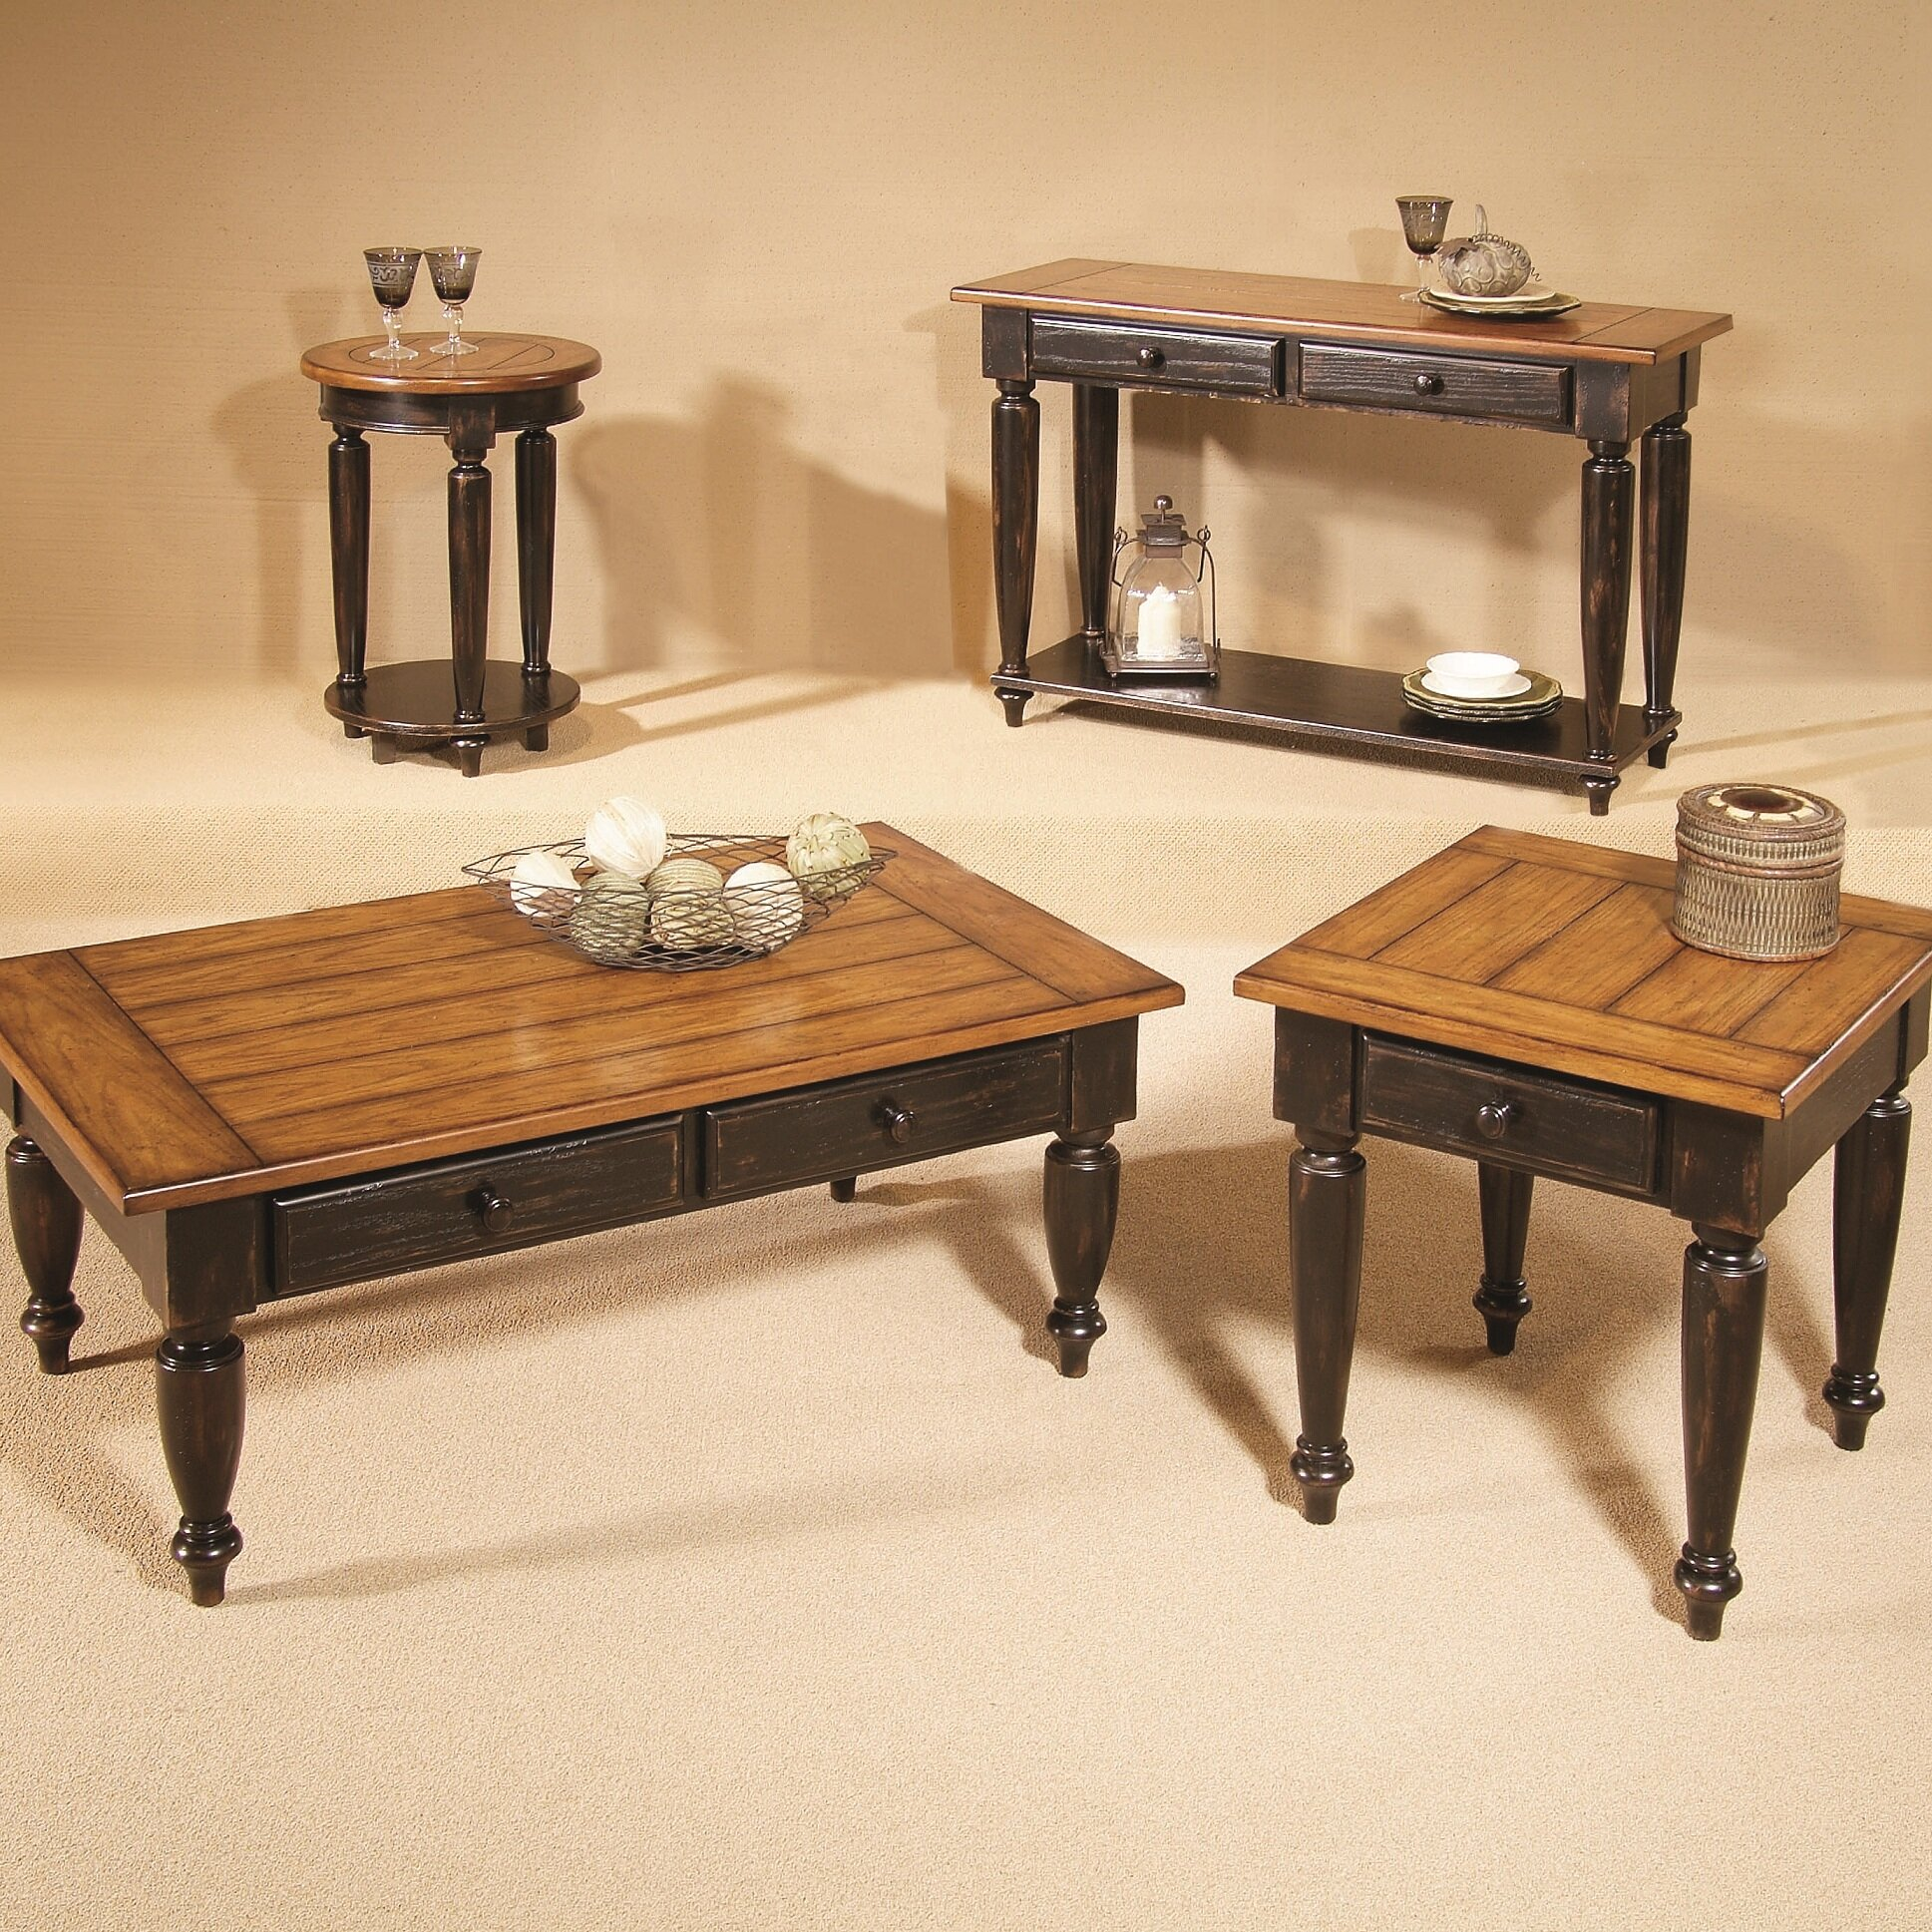 loon peak arona coffee table set reviews. Black Bedroom Furniture Sets. Home Design Ideas